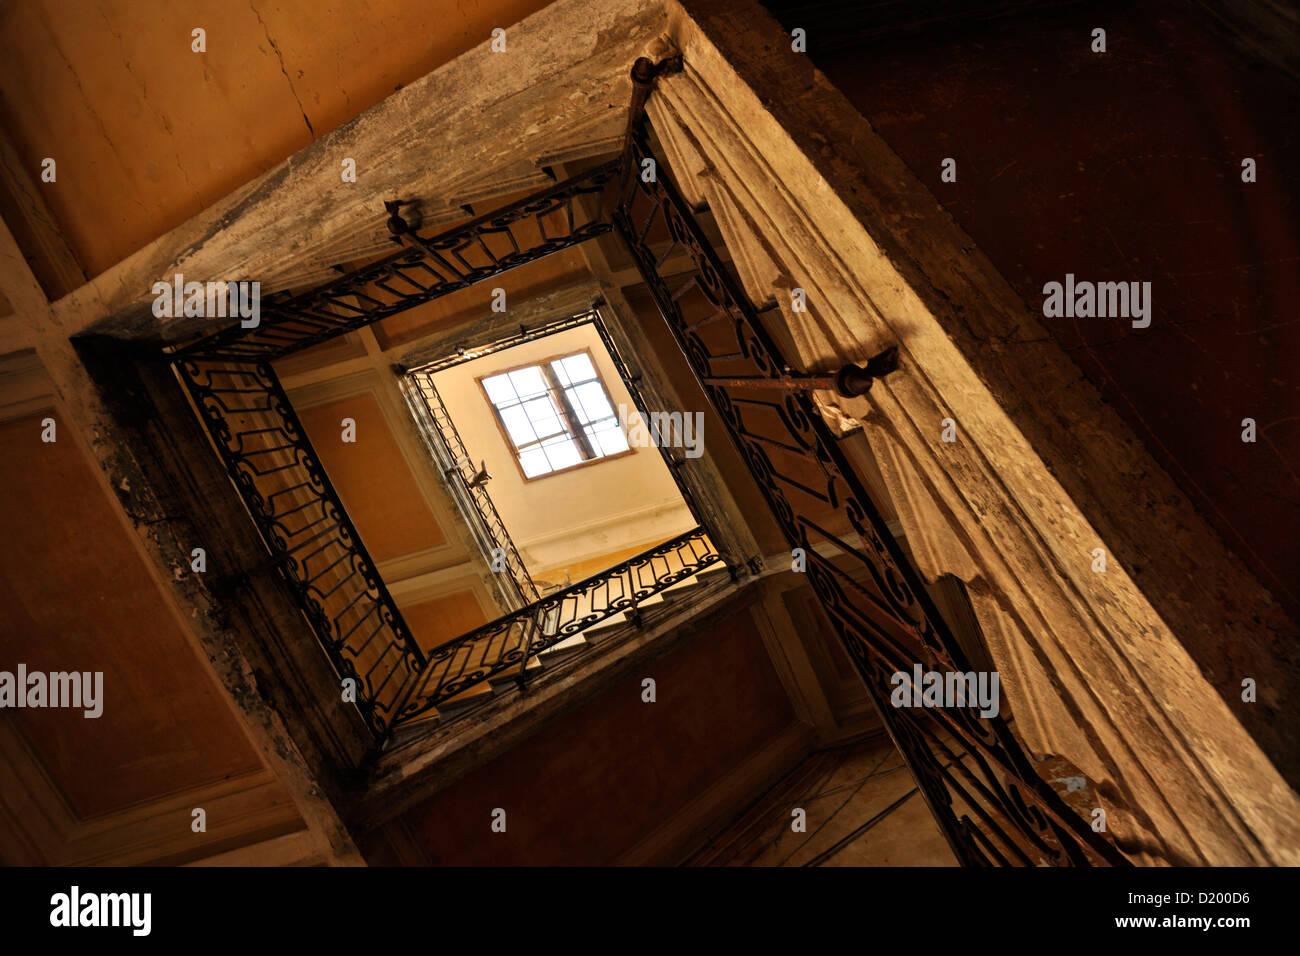 S.Croce, Backyard, Staircase, Venice, Italy - Stock Image